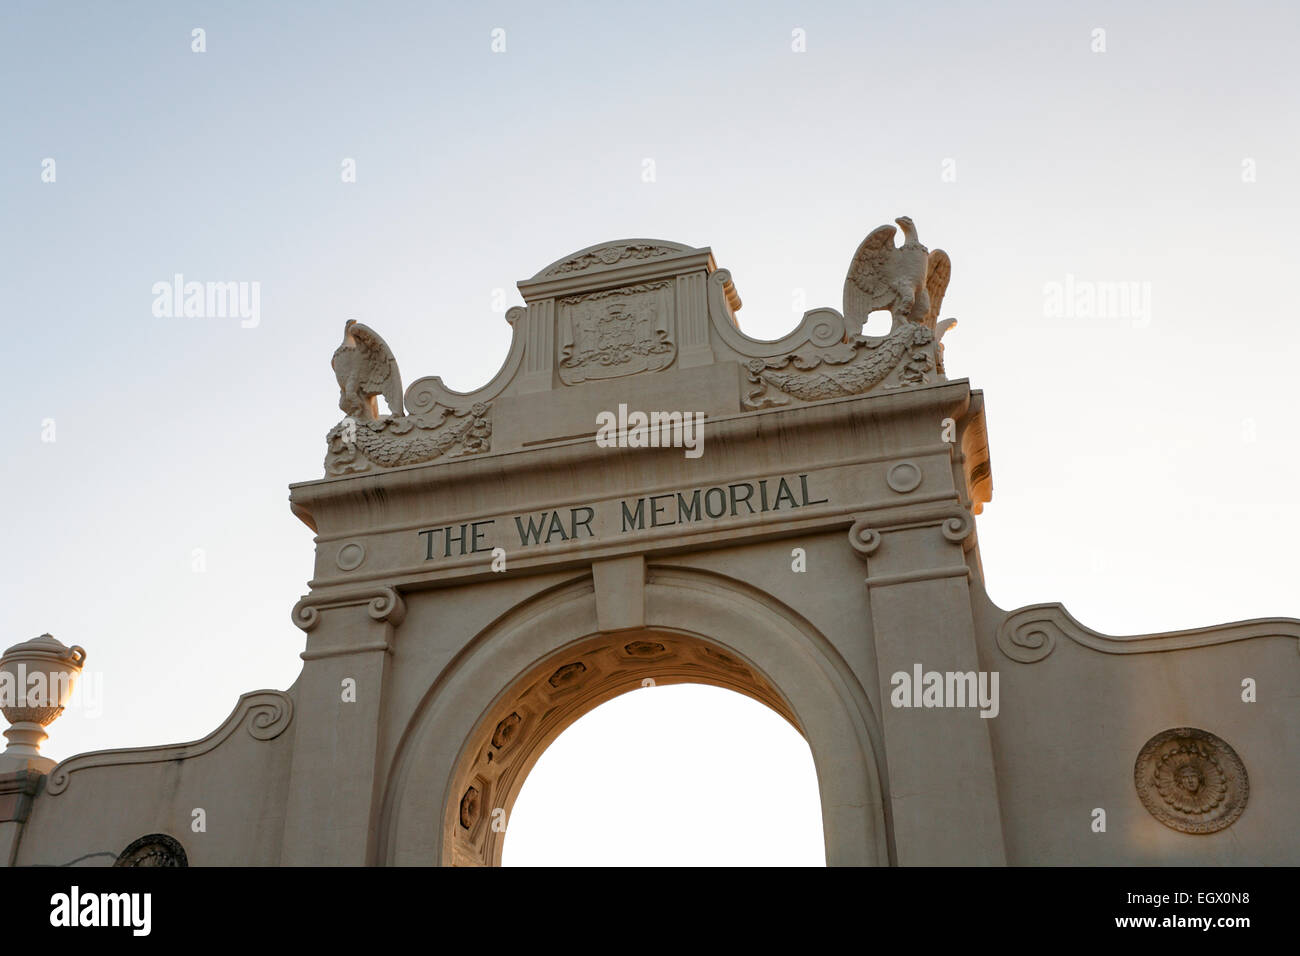 Honolulu, Hawaii, USA. 22nd Feb, 2015. The arch entrance to the Waikiki Natatorium War Memorial, Honolulu, Oahu, - Stock Image